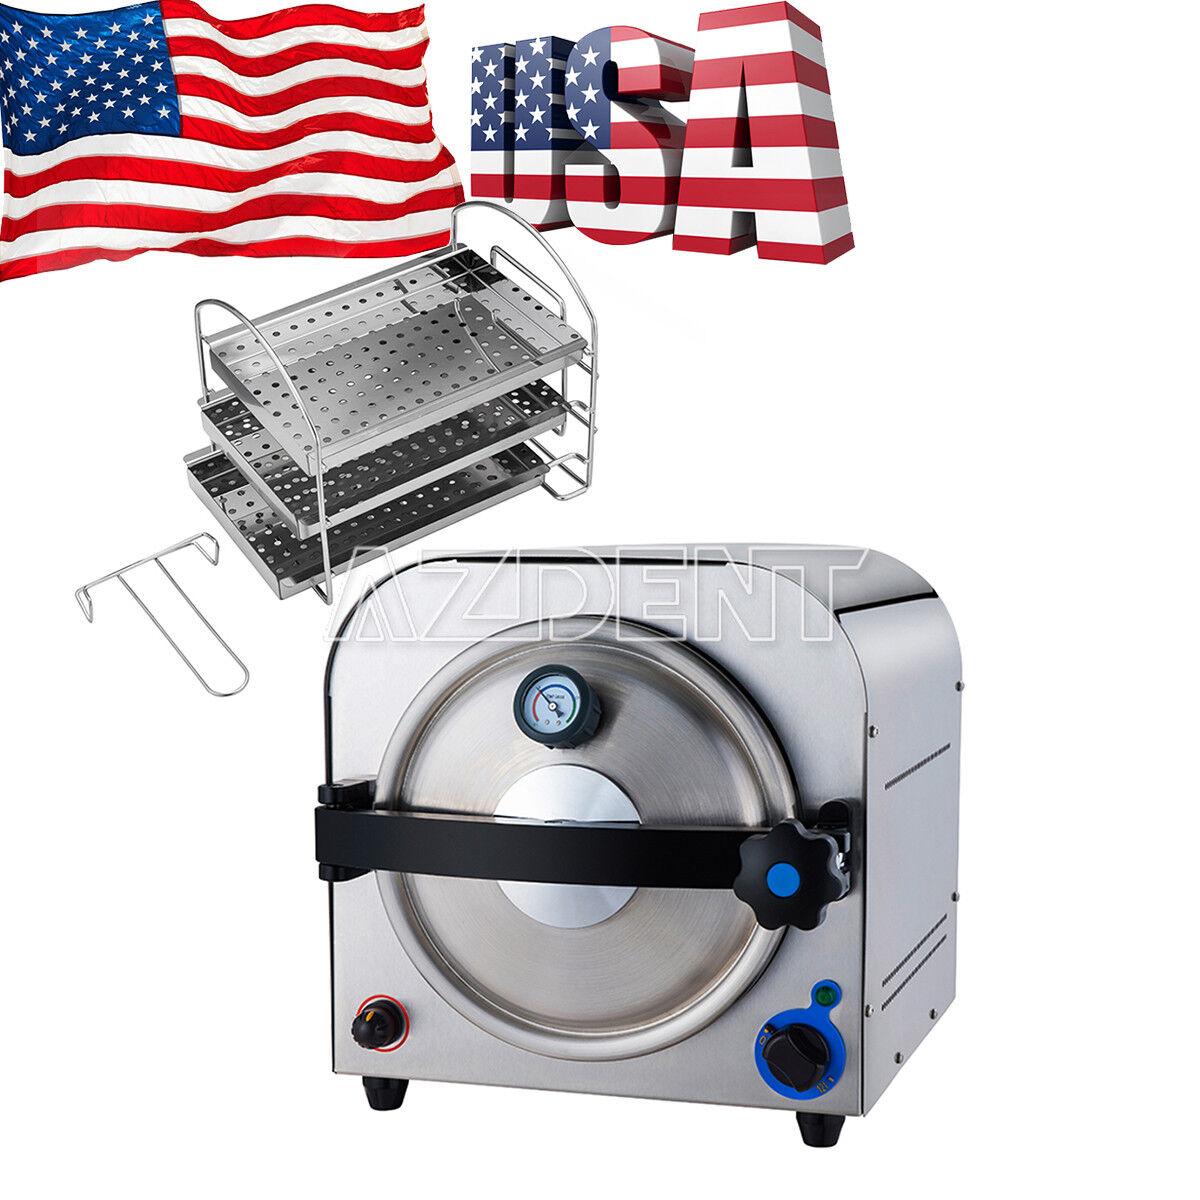 Dental 14L Autoclave Steam Sterilizer Medical Sterilization Lab Equipment TR250E - $349.99